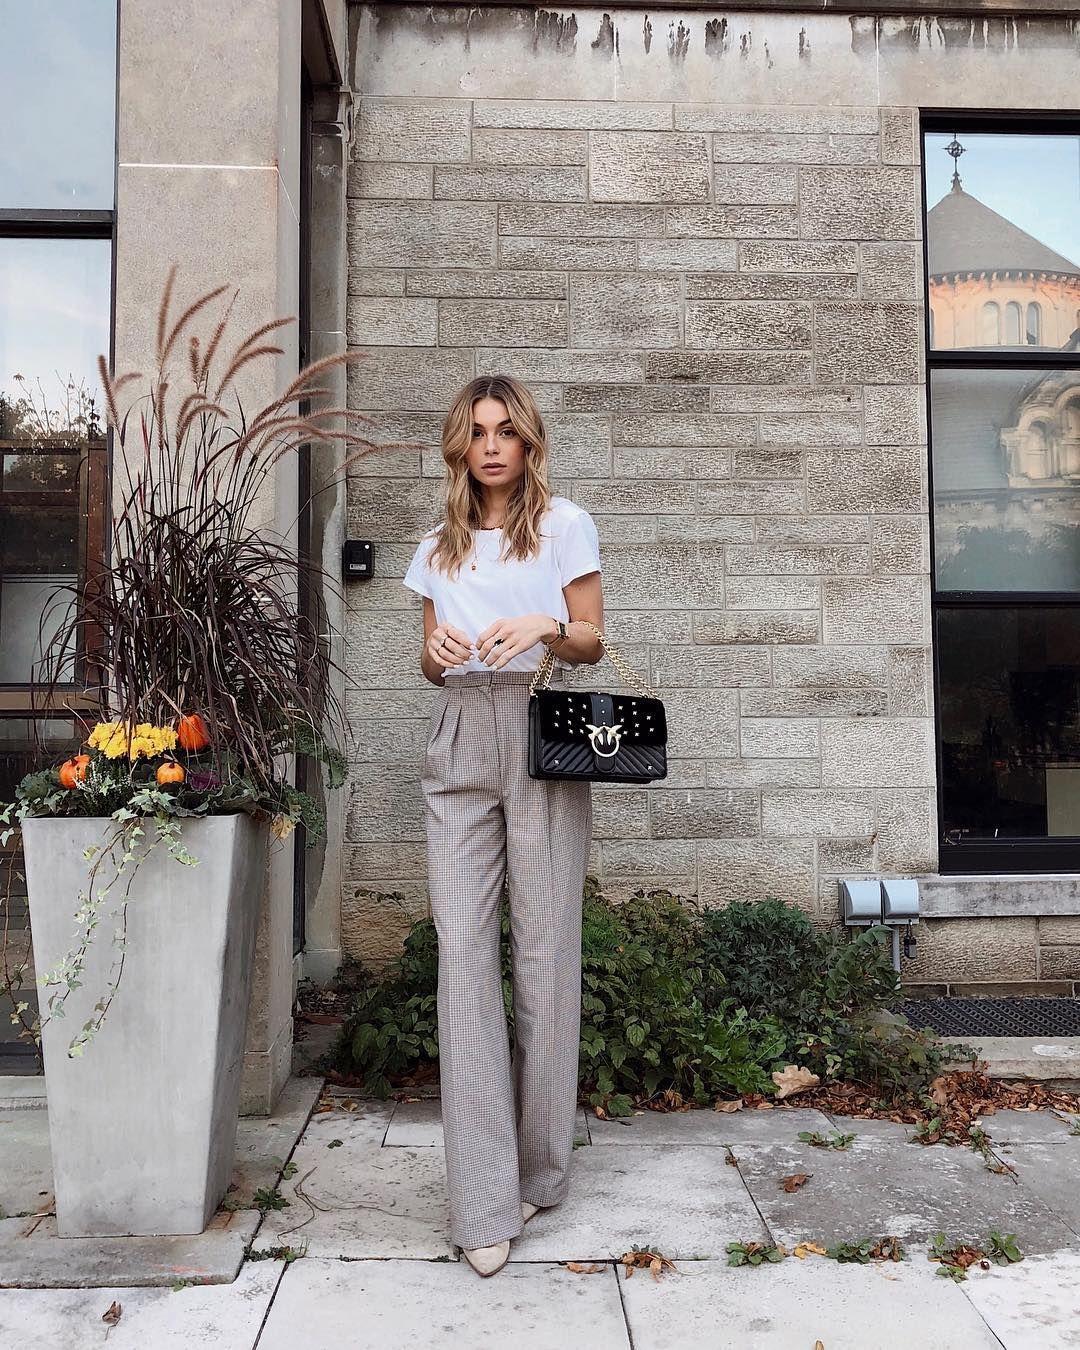 Allegra Shaw on Instagram | 70 degrees in 2019 | Business